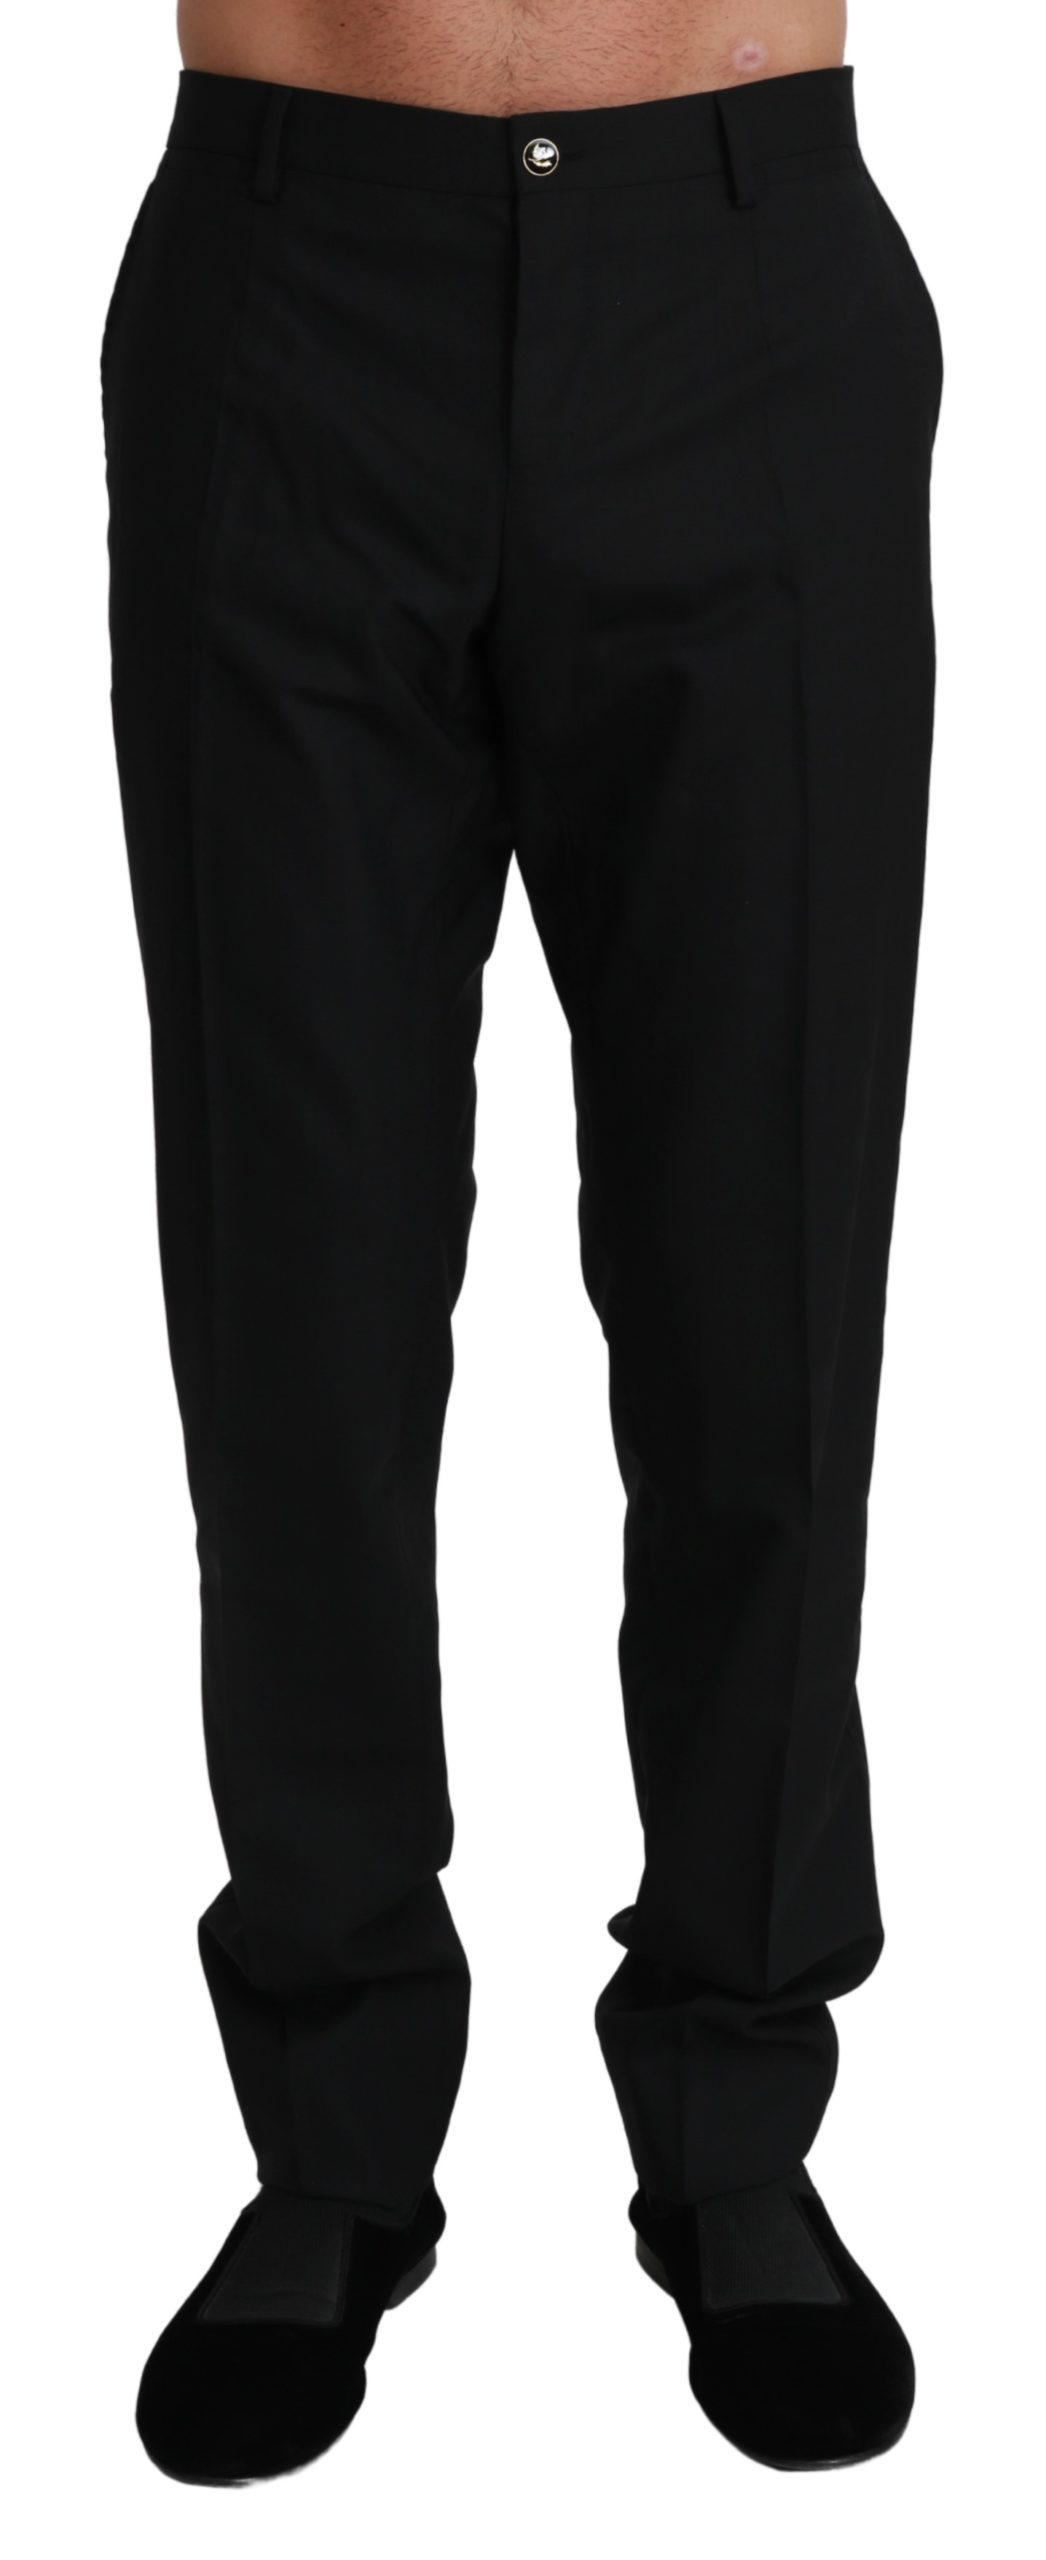 Dolce & Gabbana Men's Formal Dress Virgin Wool Trouser Black PAN71004 - IT50   L